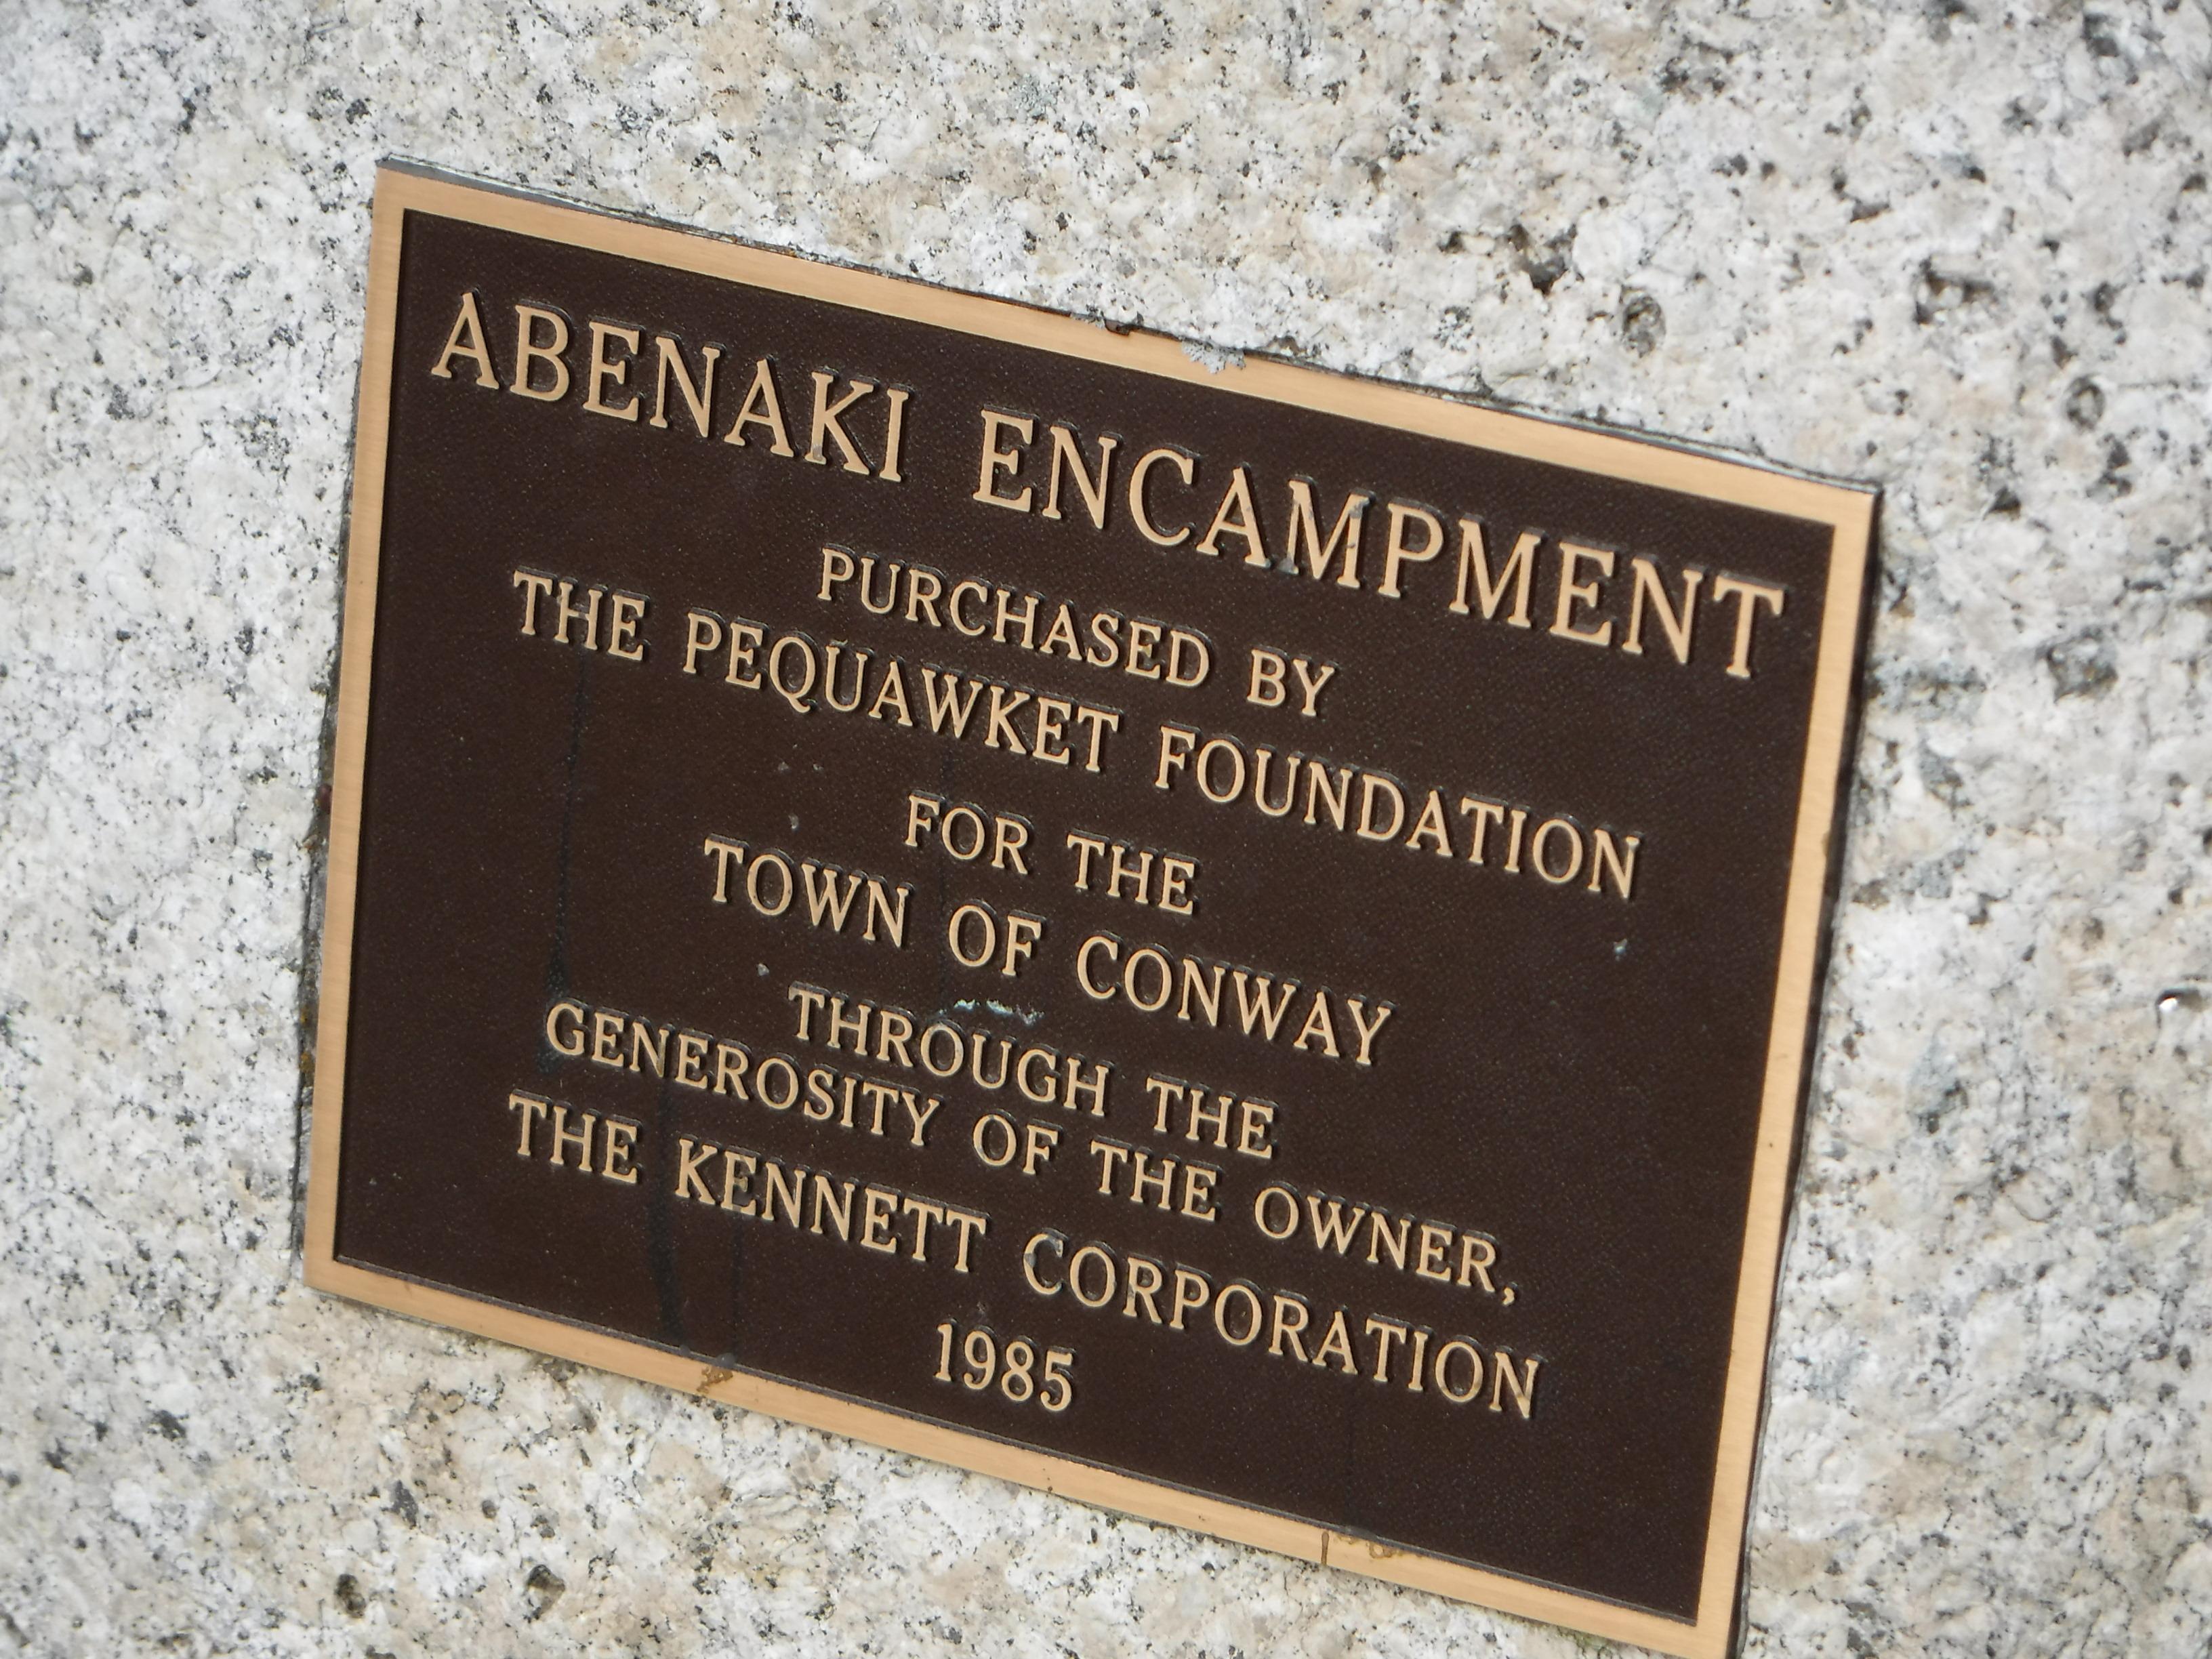 Detail of acknowledgement plaque